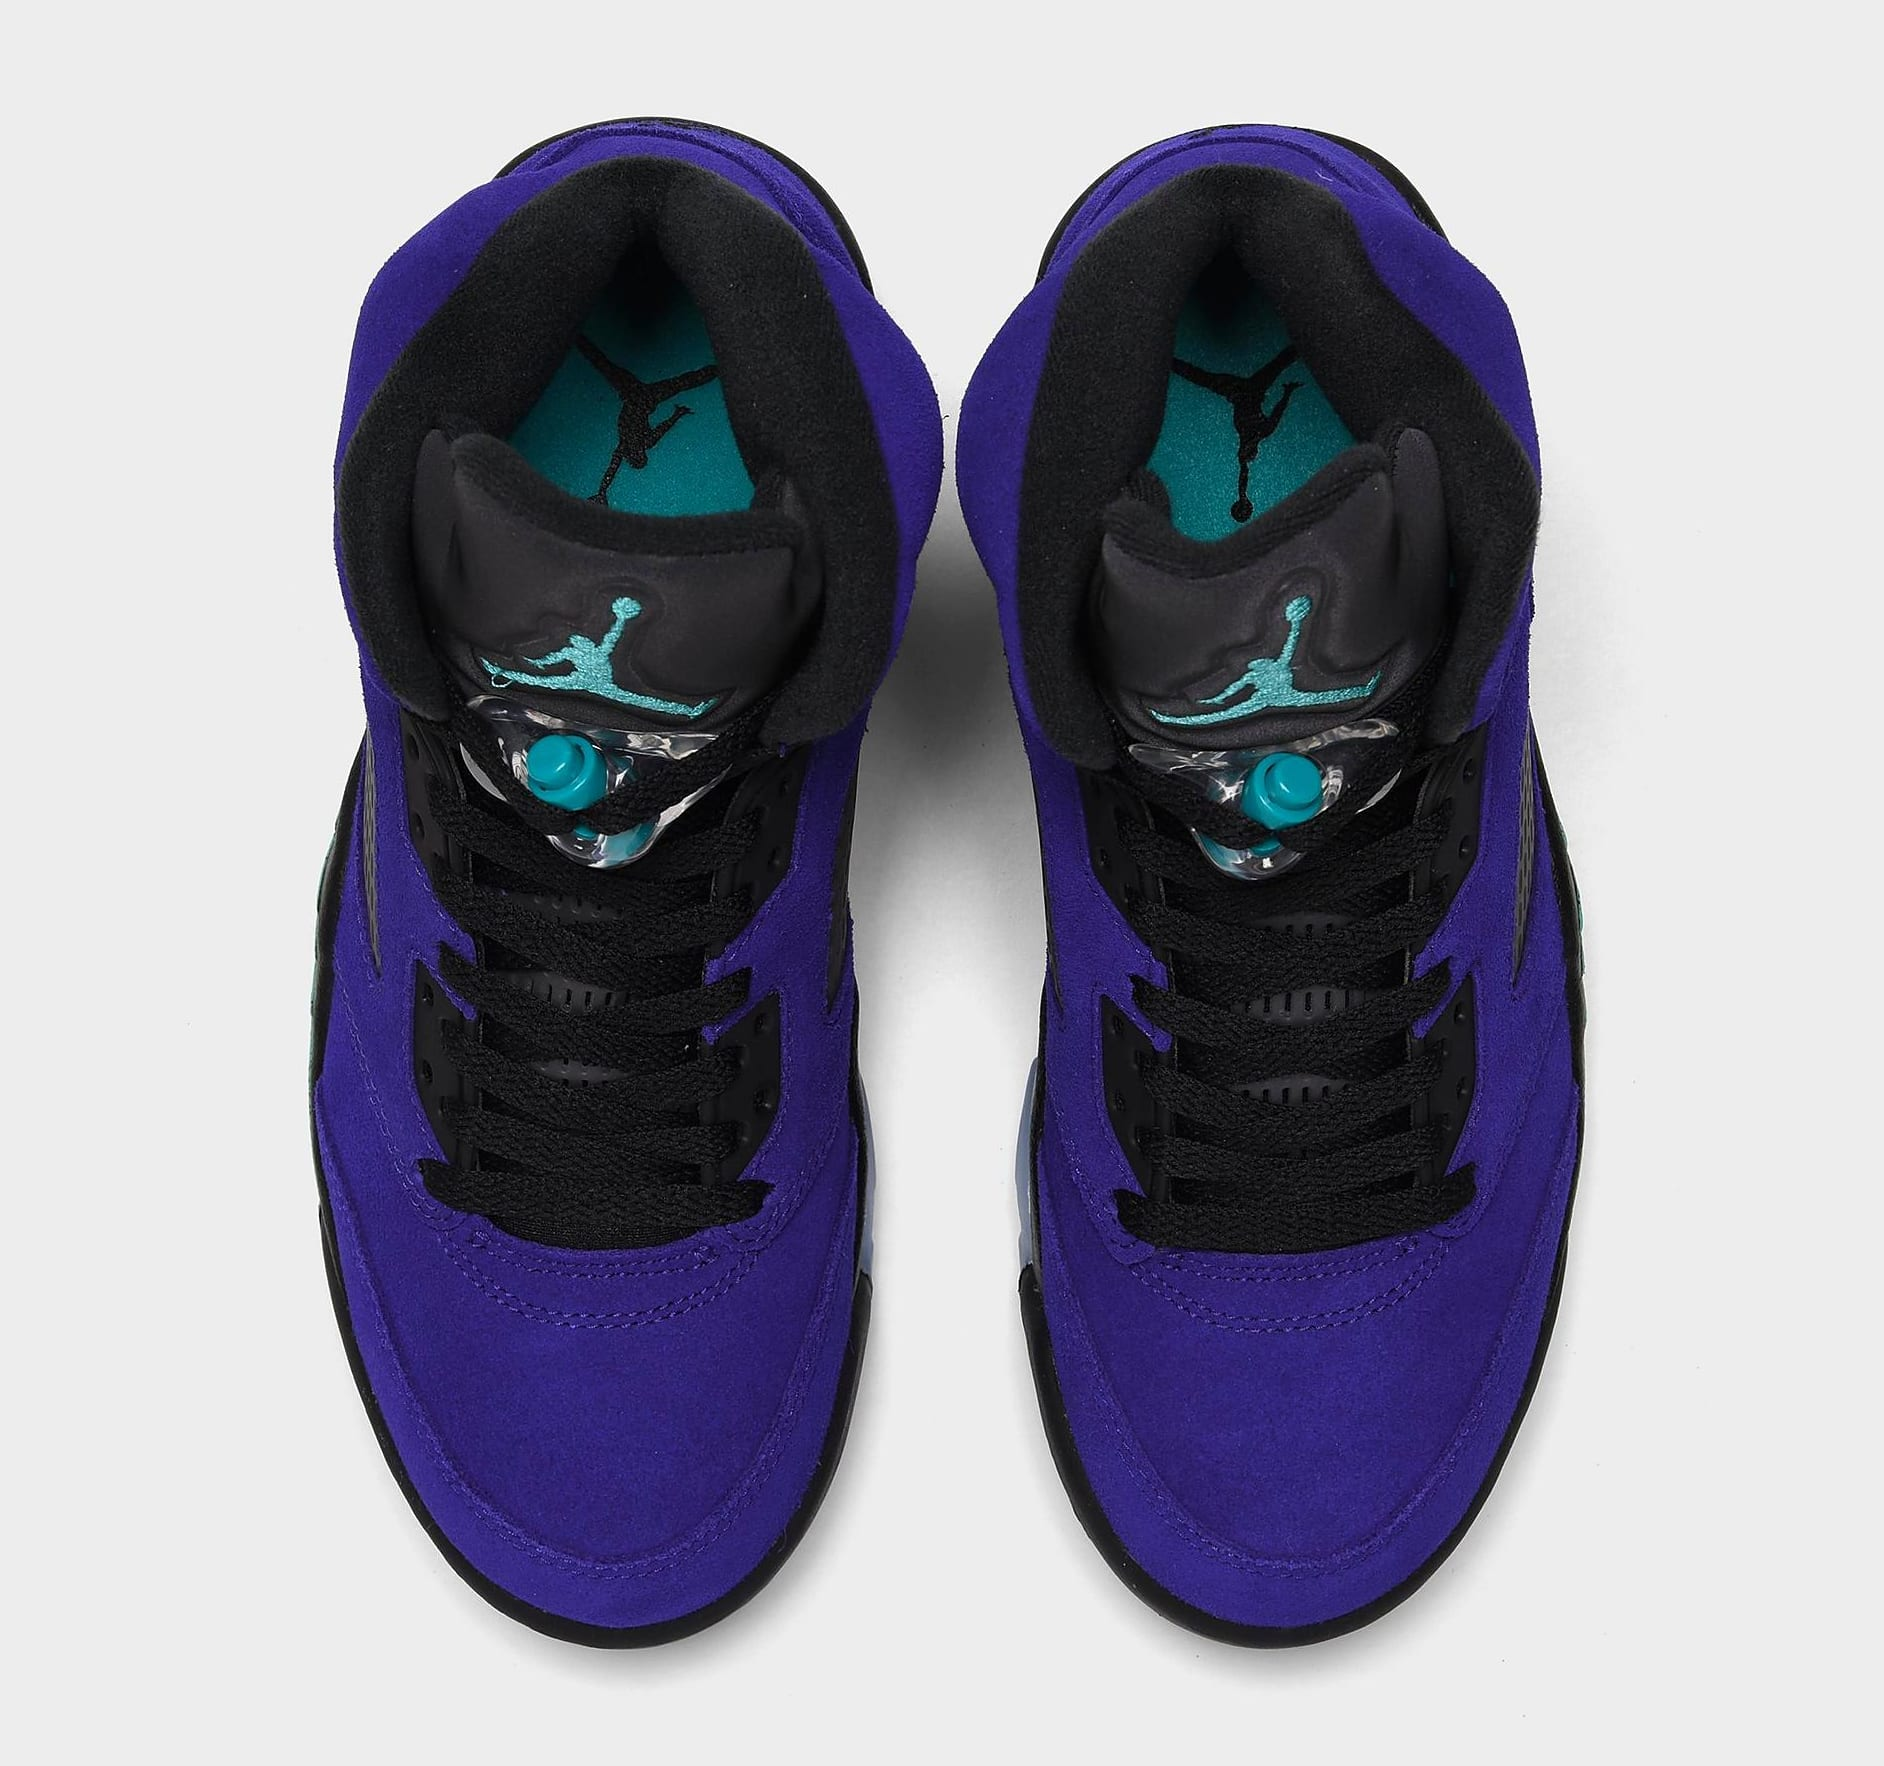 Air Jordan 5 Retro 'Alternate Grape' 136027-500 Top